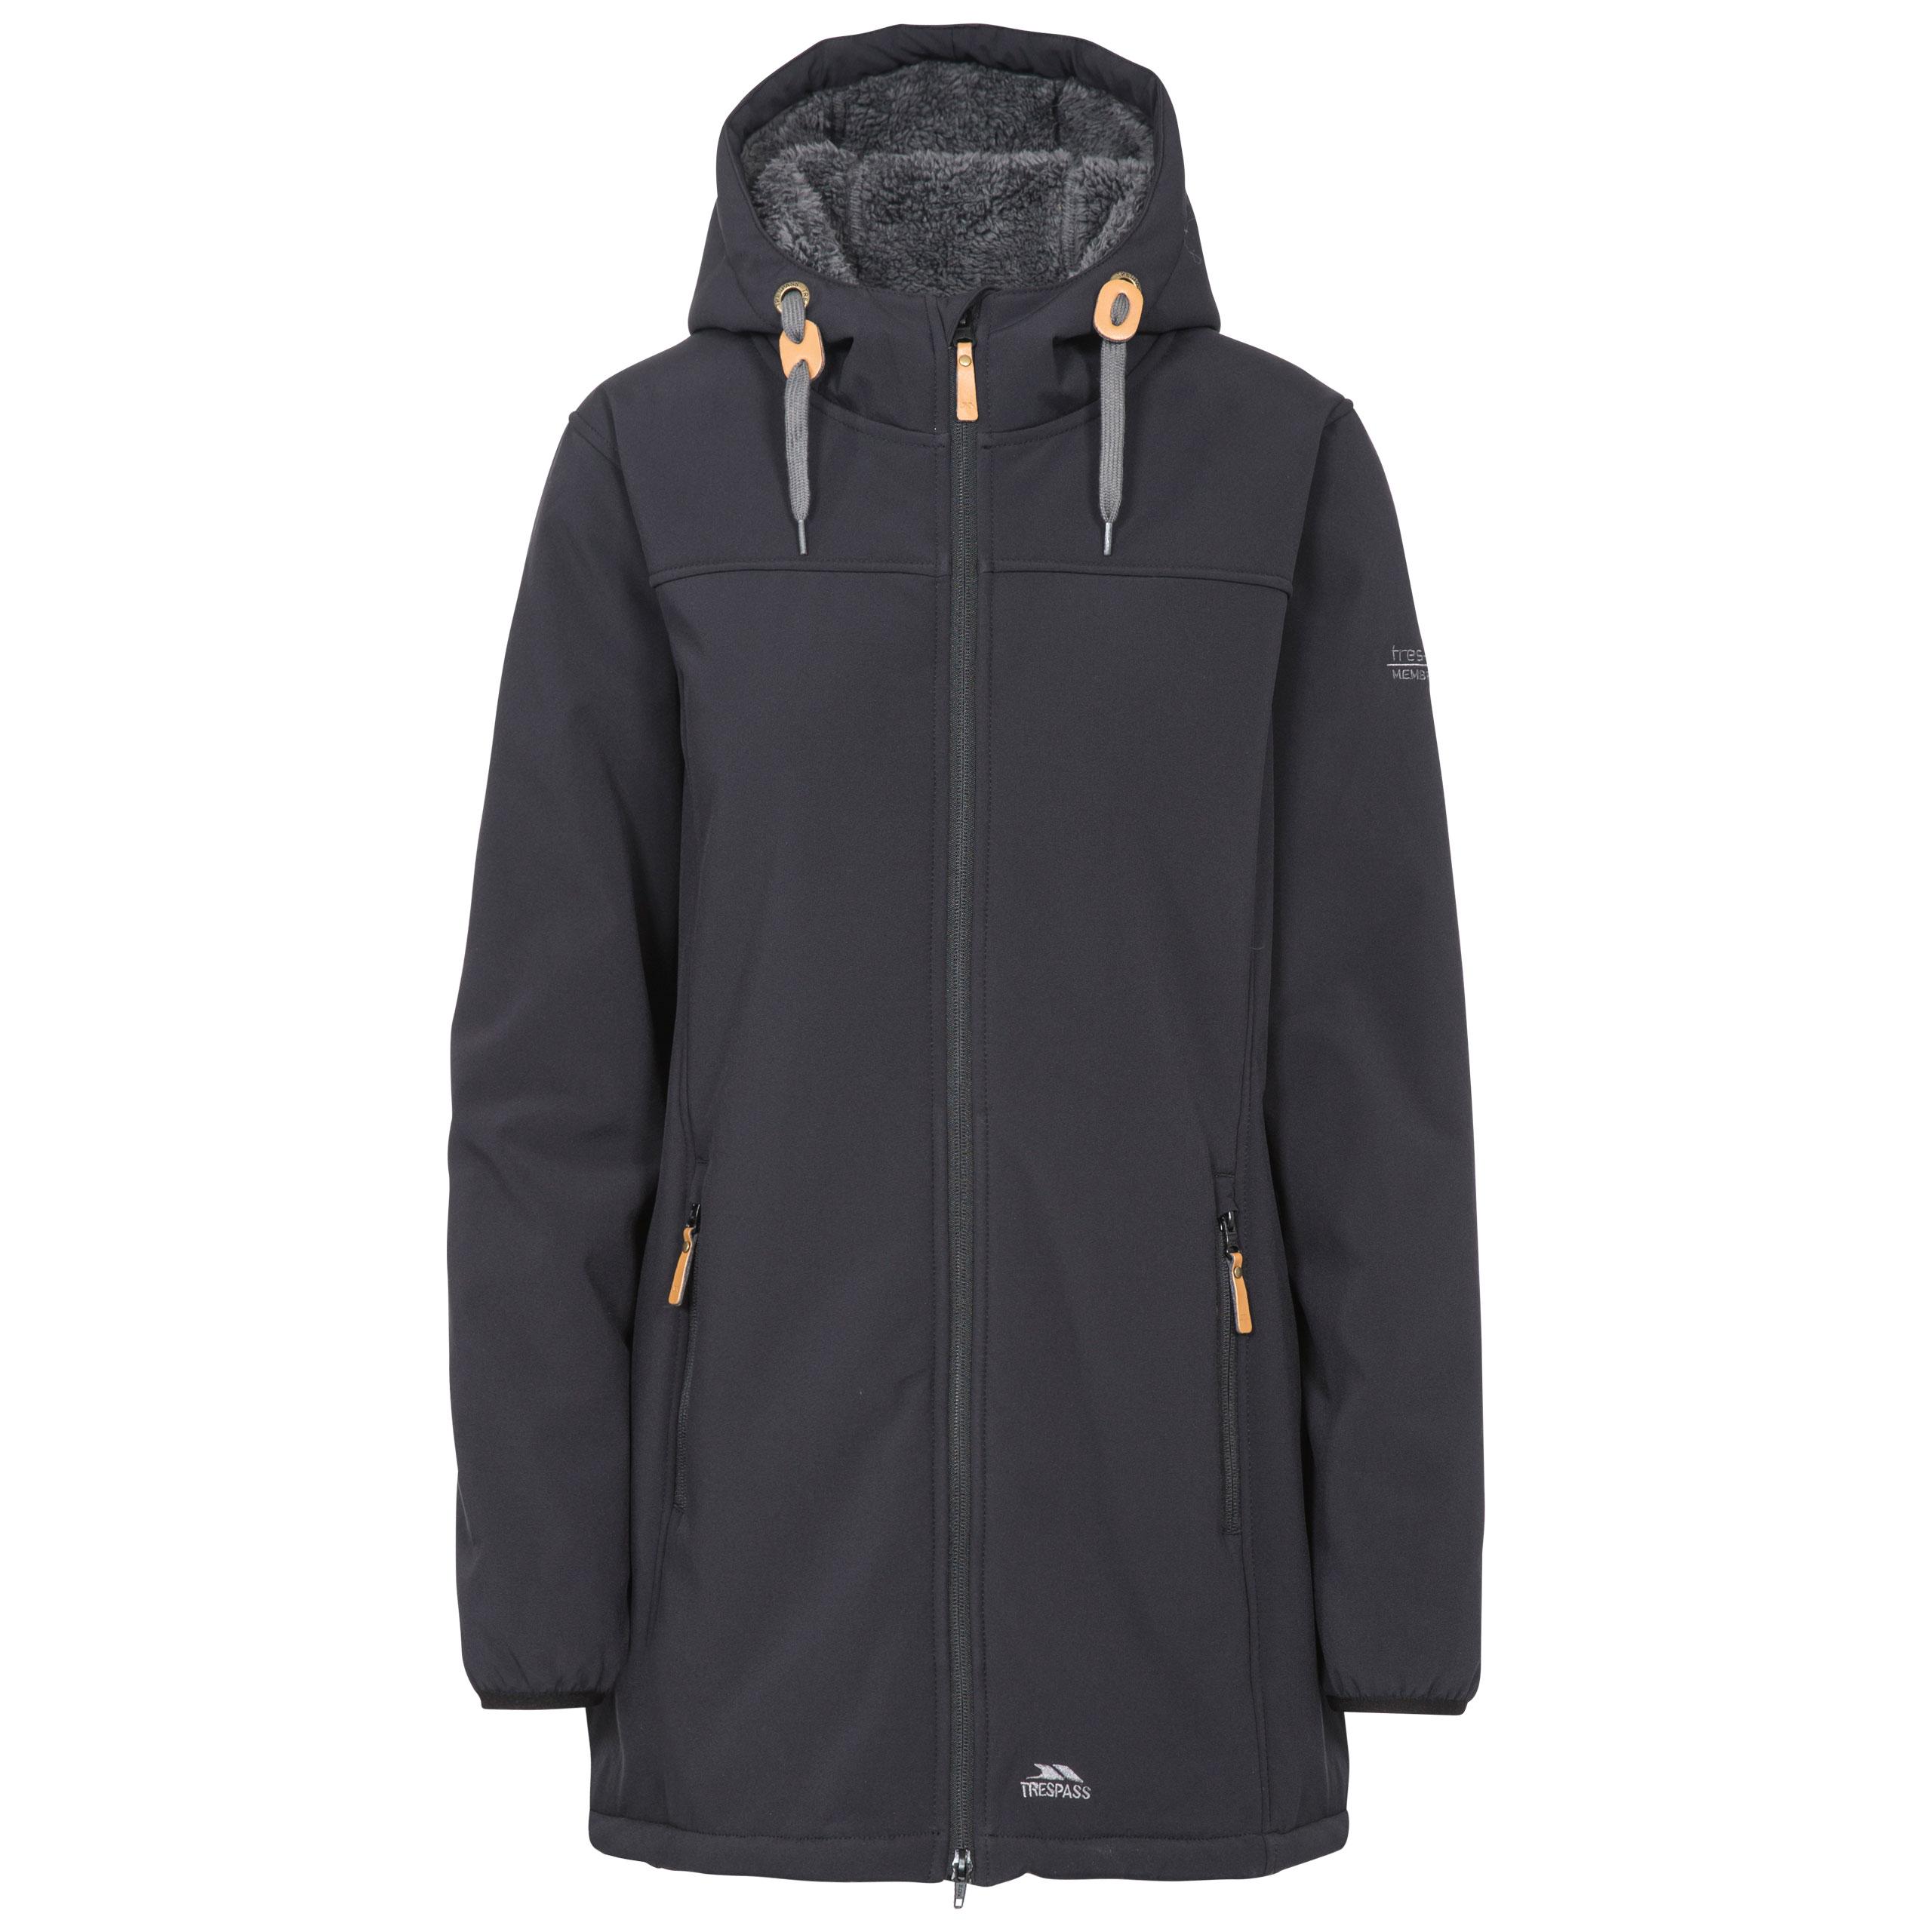 Trespass Ladies Kristen Hip Length Waterproof RaincoatLong Warm Rain Jacket